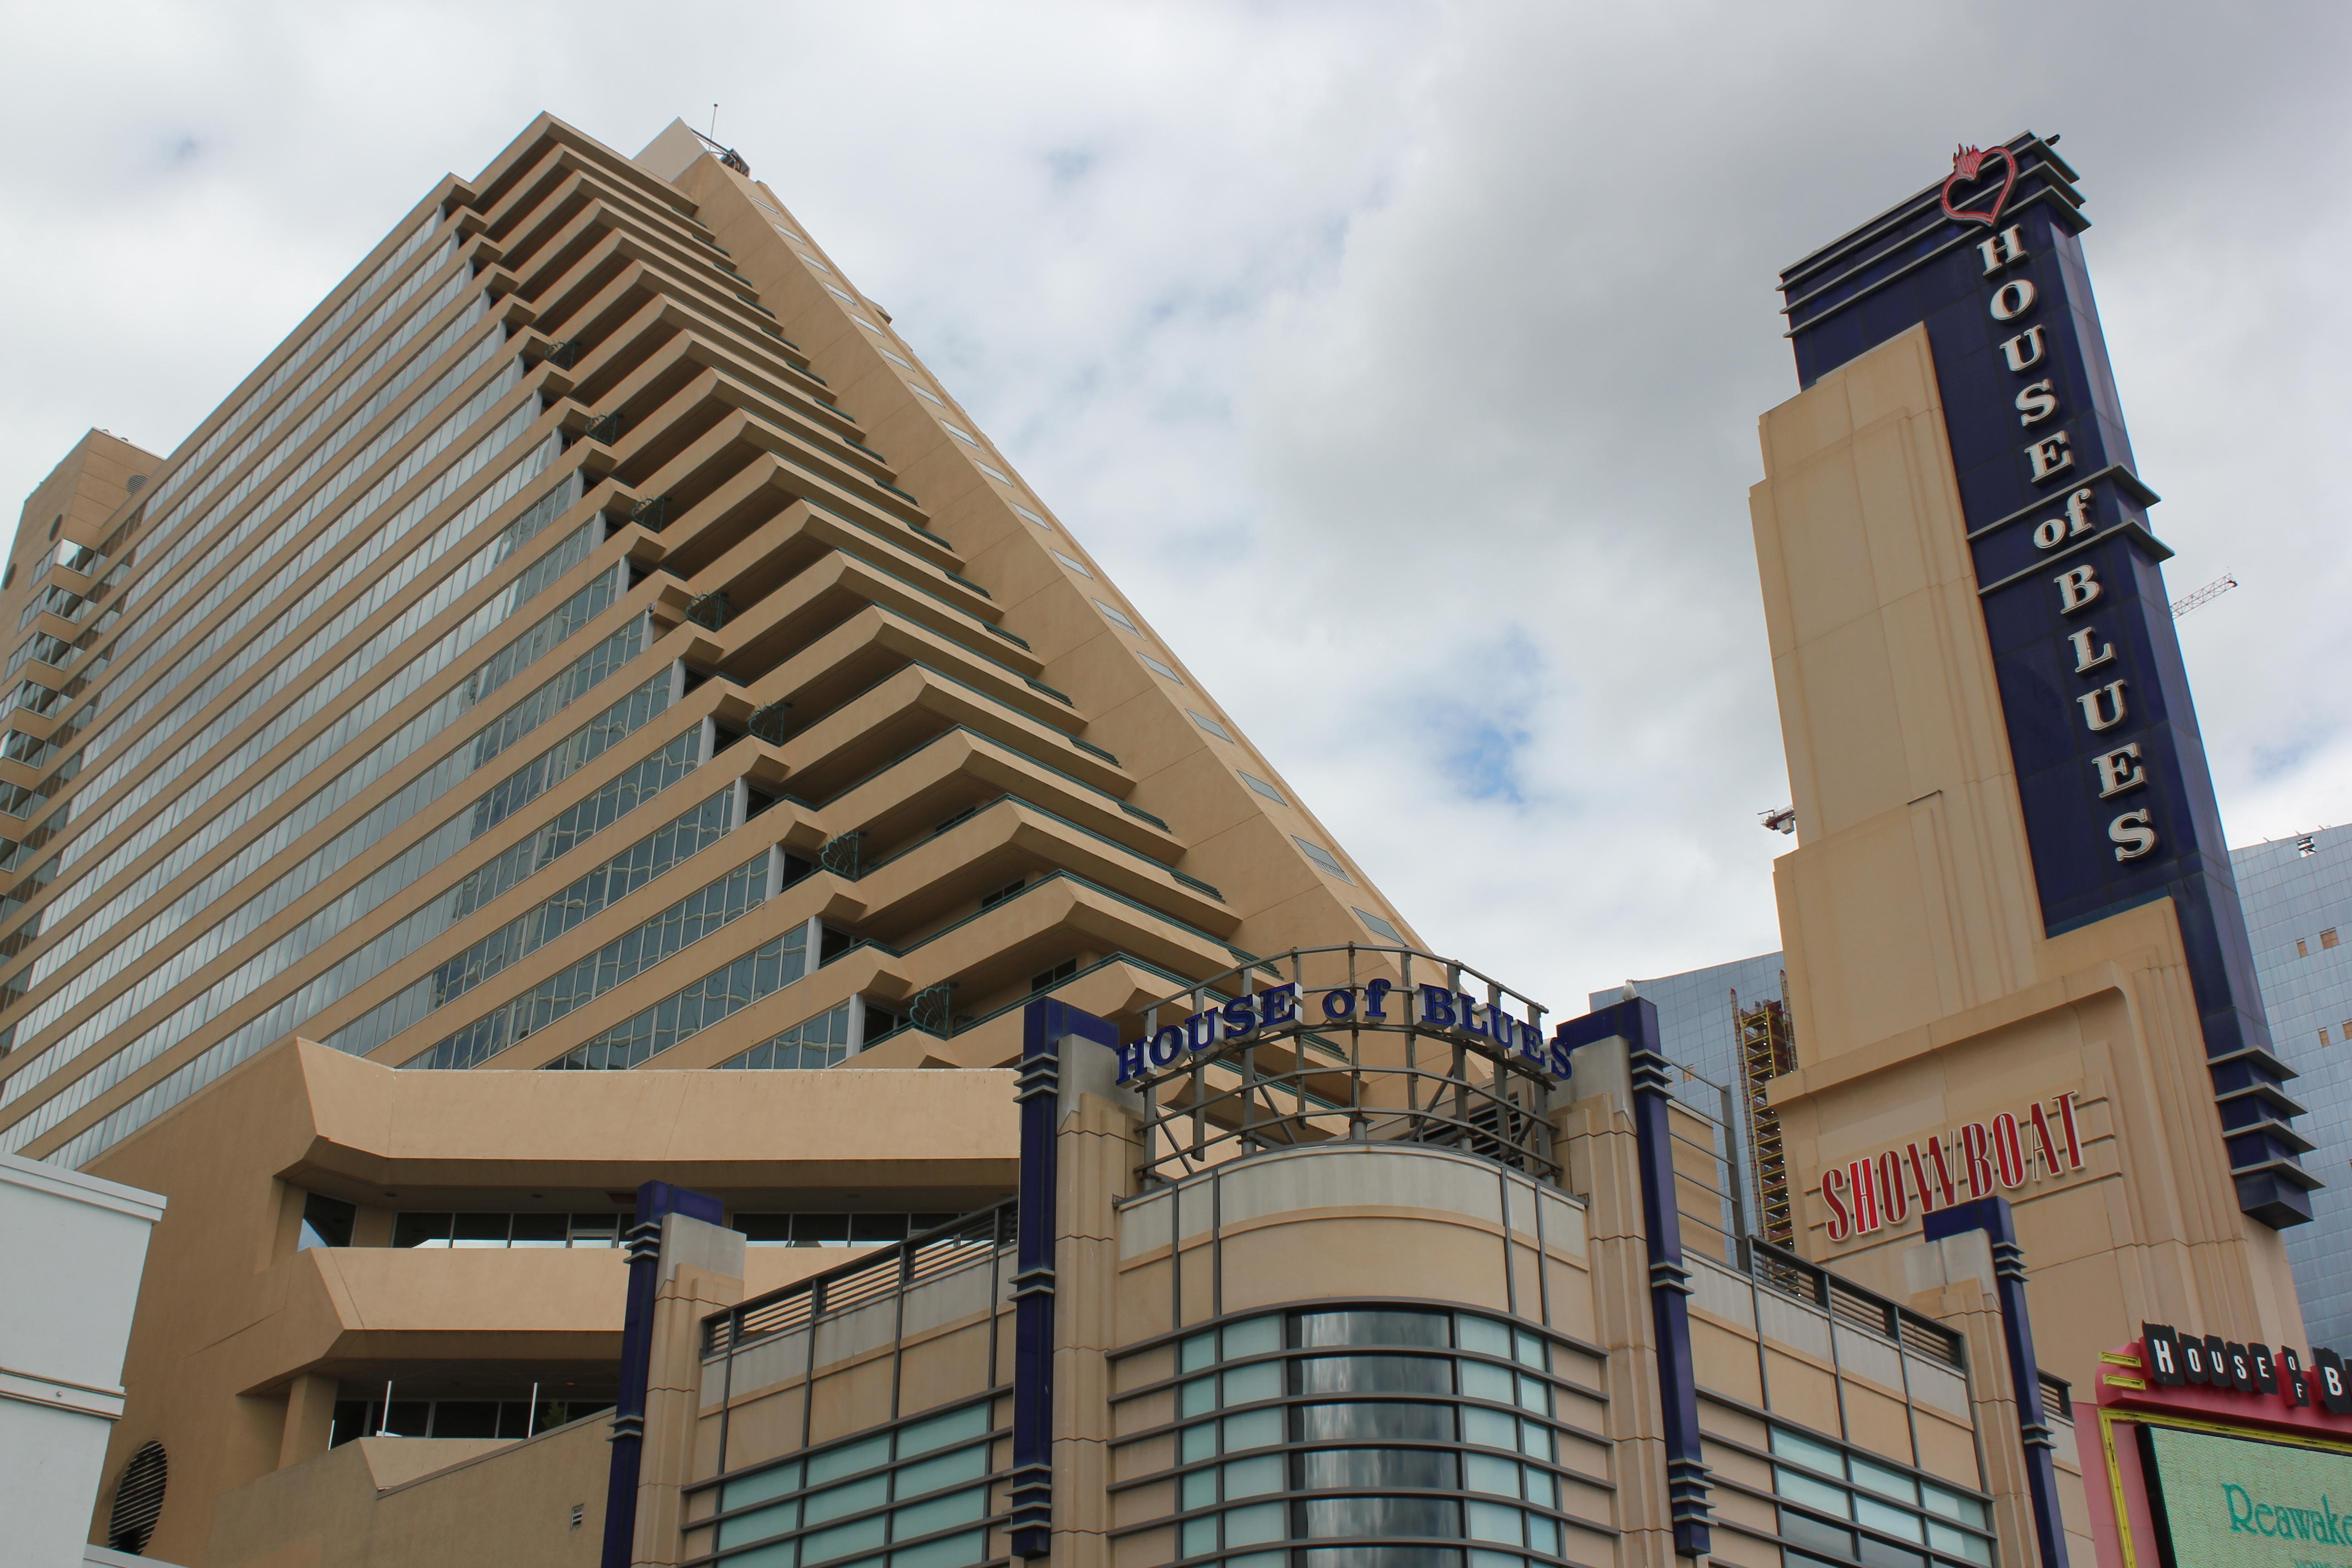 Showboat Hotel Atlantic City Bed Bugs